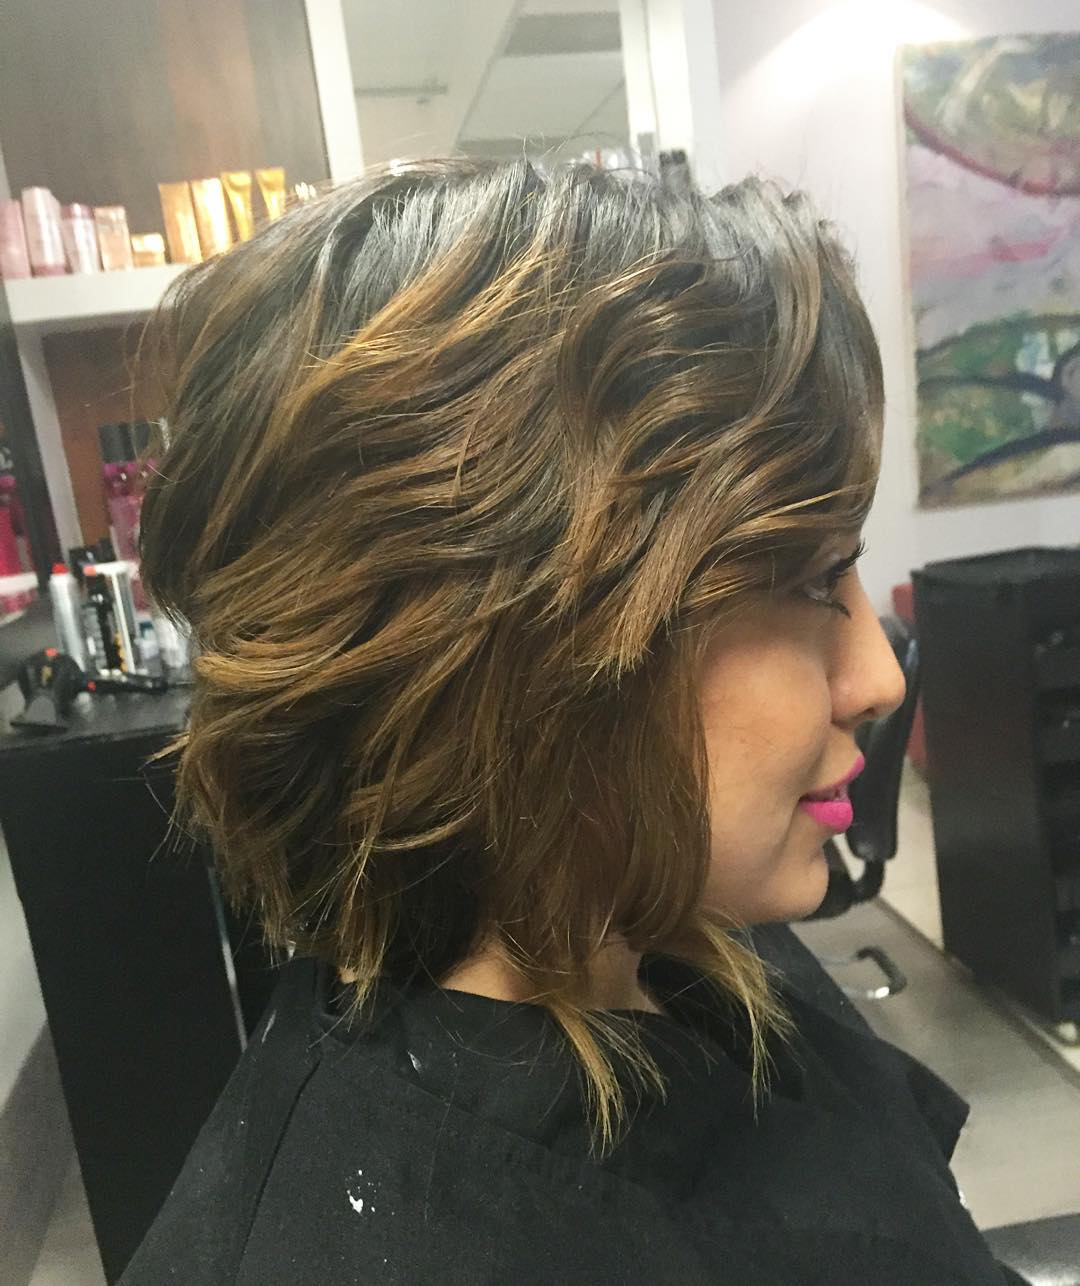 Hairstyles Curly Medium Length Choppy